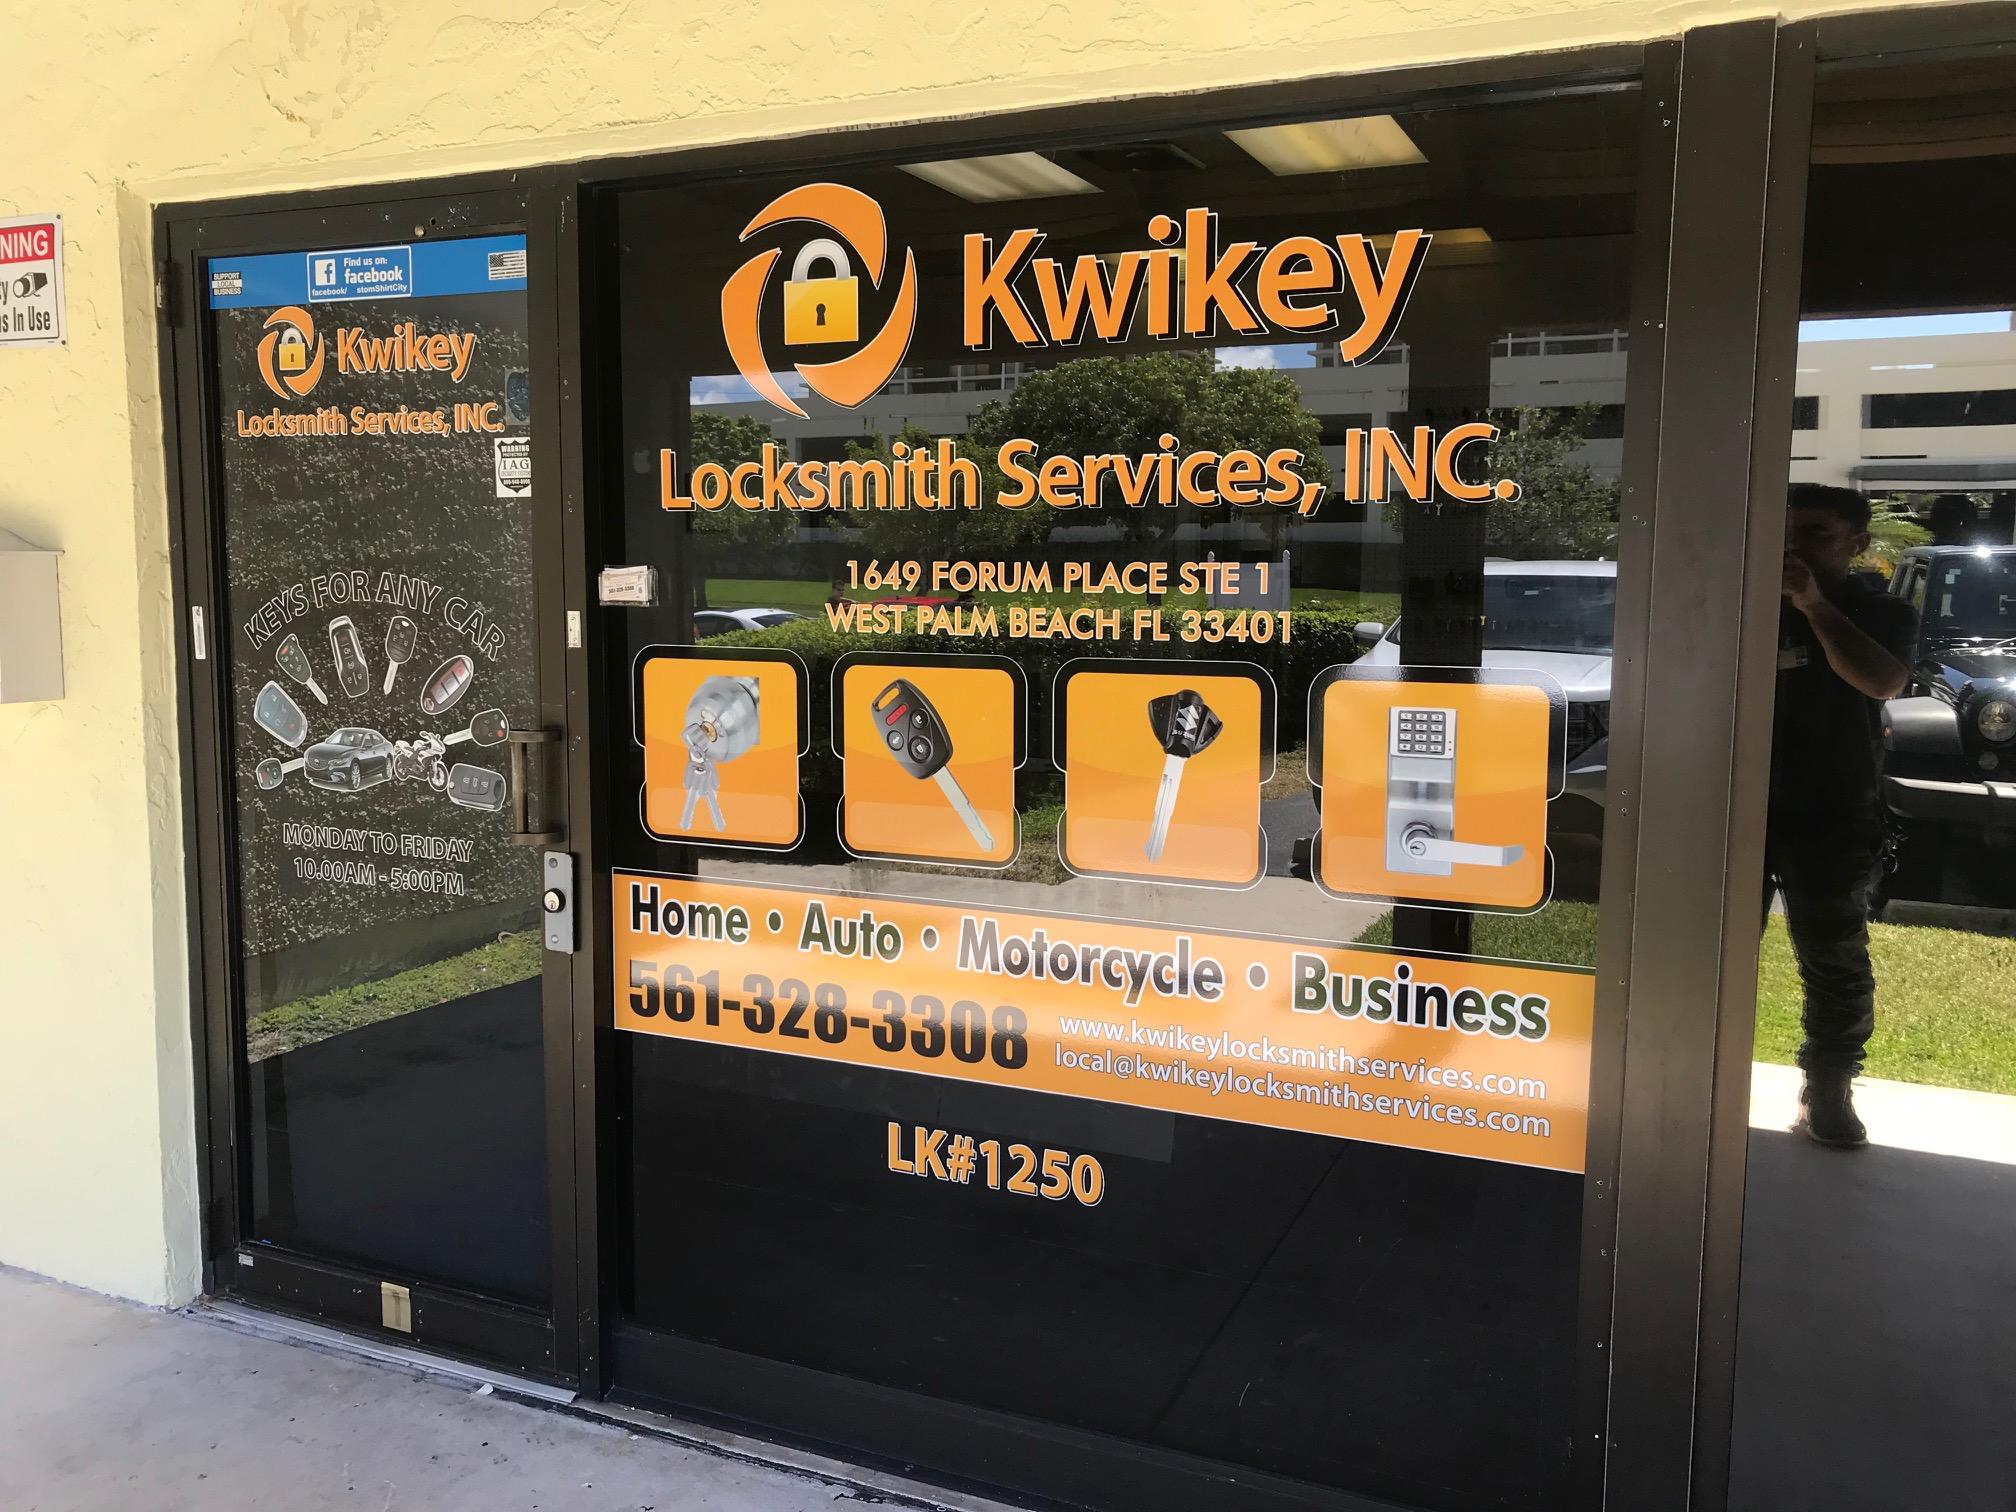 Your Go-To Locksmith - (561) 328-3308